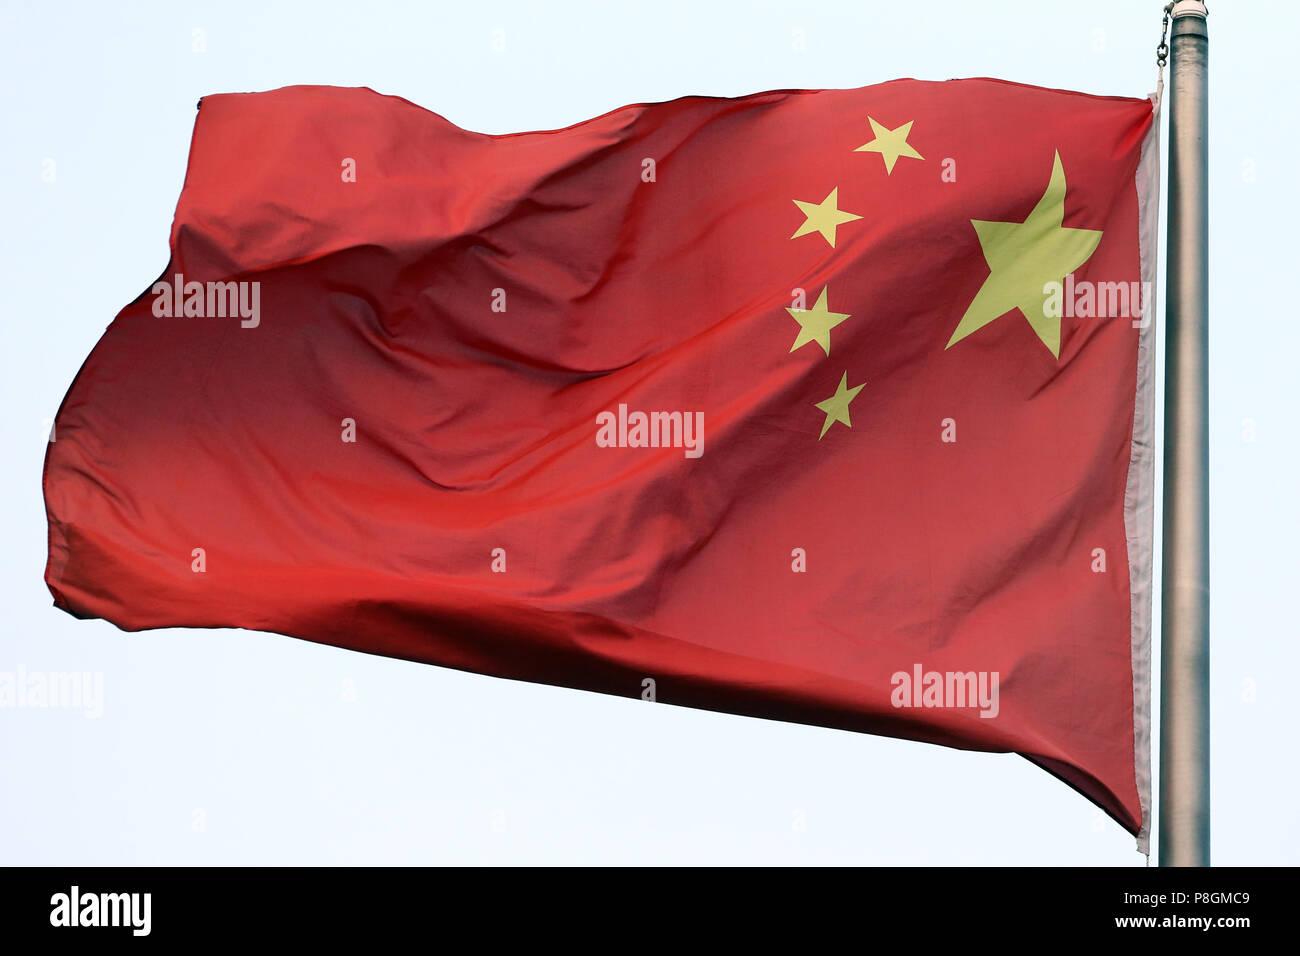 Hong Kong, China, National flag of the People's Republic of China - Stock Image